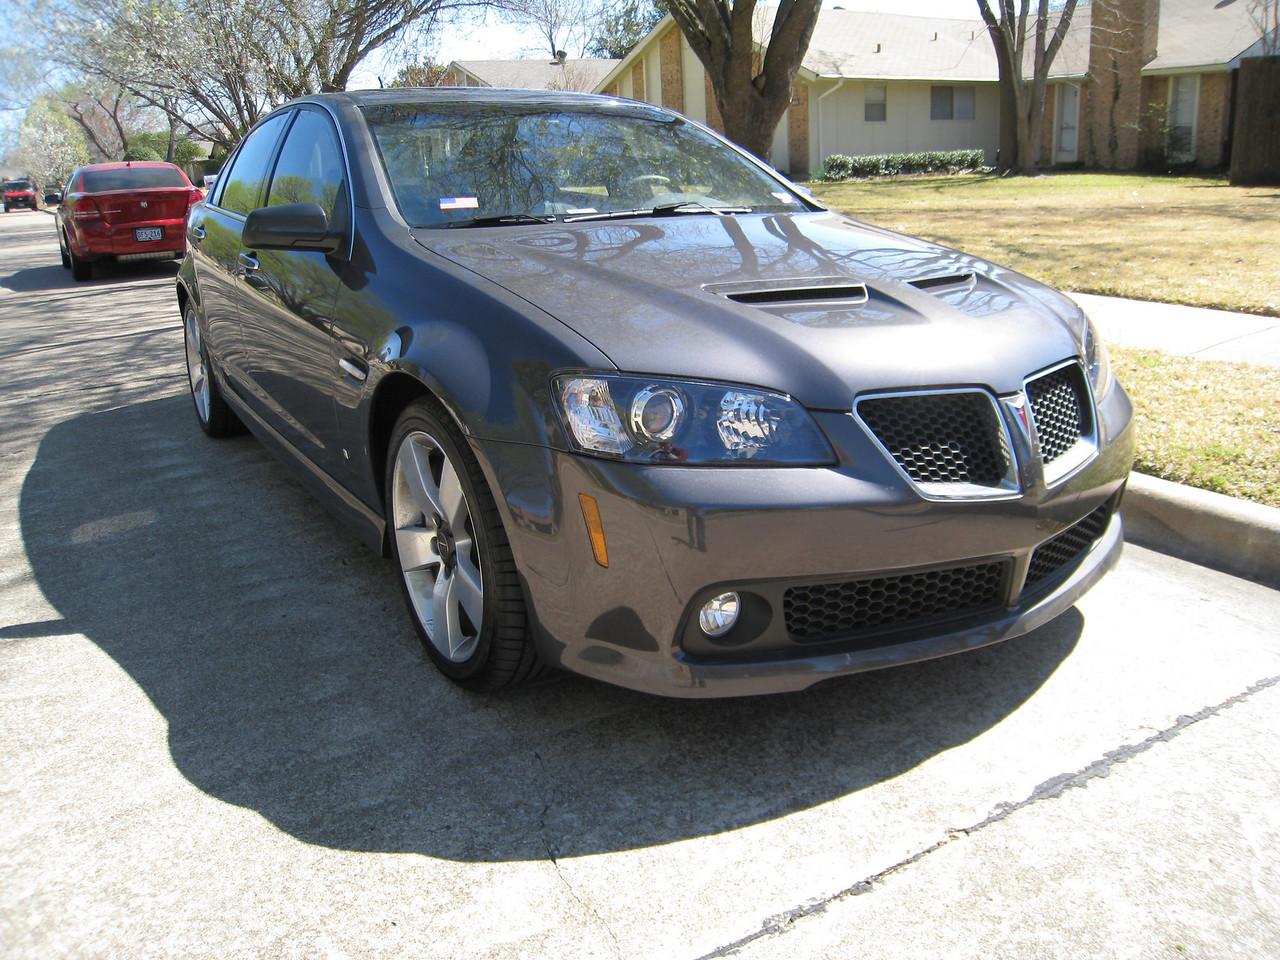 2009 Pontiac G8 GT - Magnetic Gray Metallic - March 1, 2009